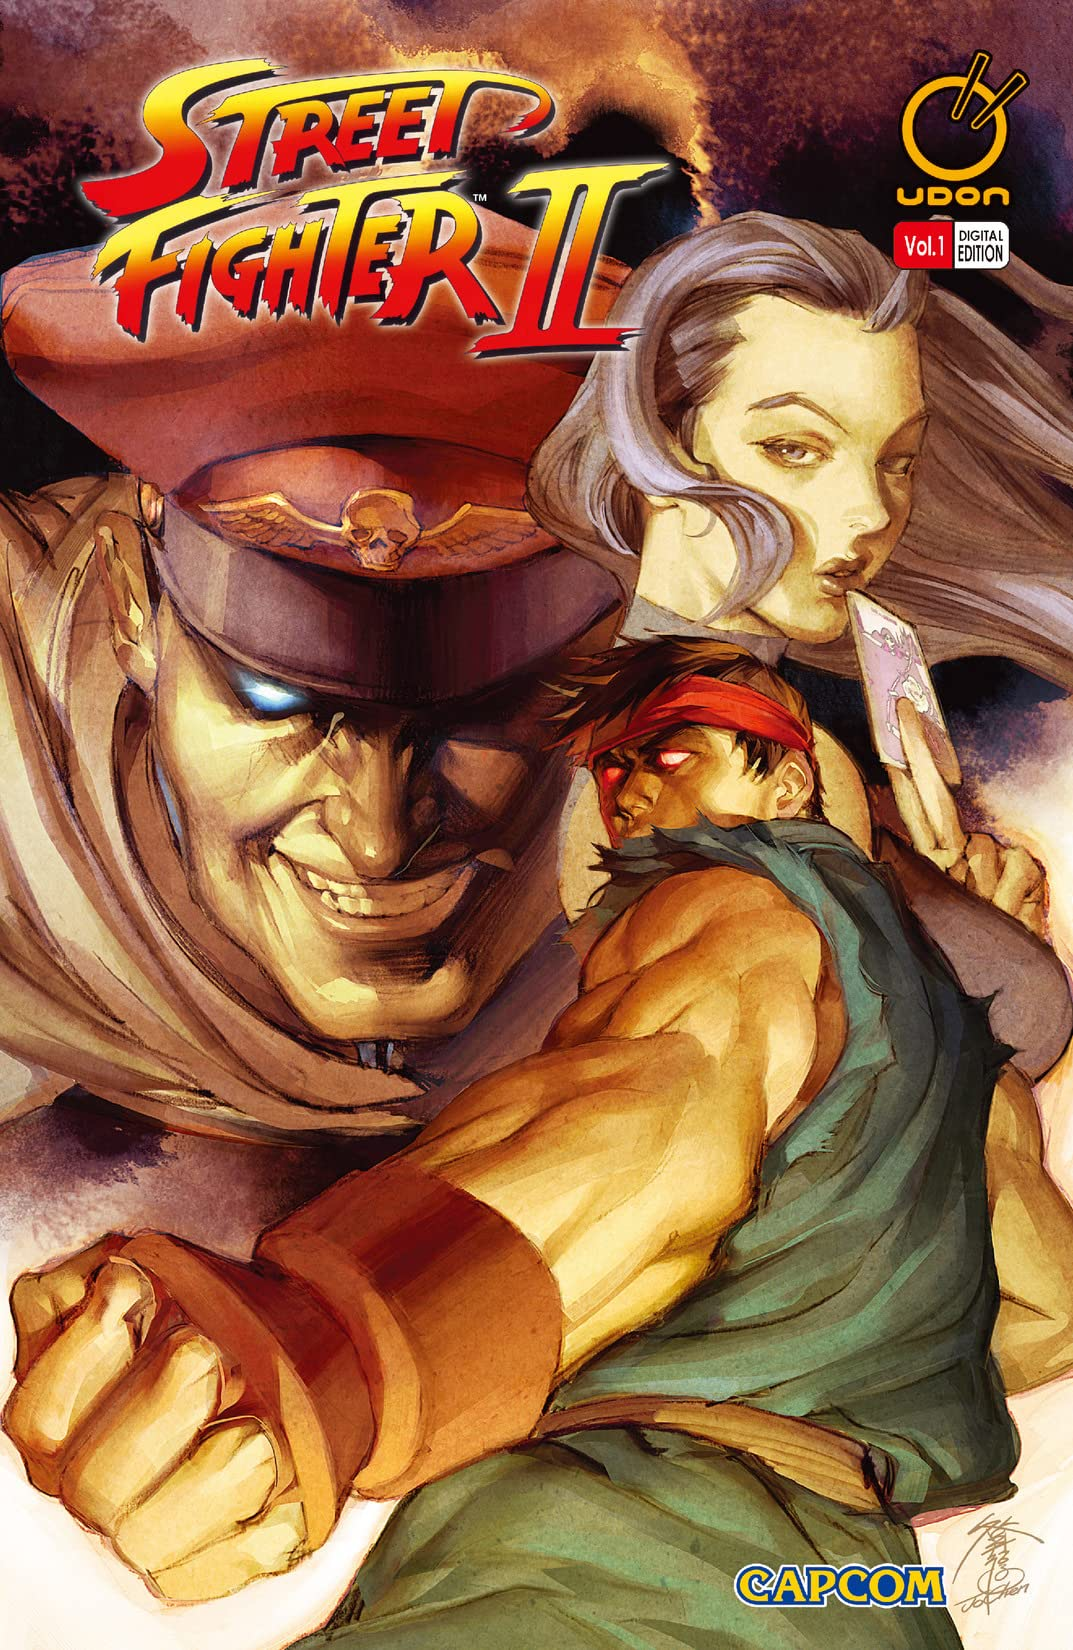 Street Fighter II Vol. 1